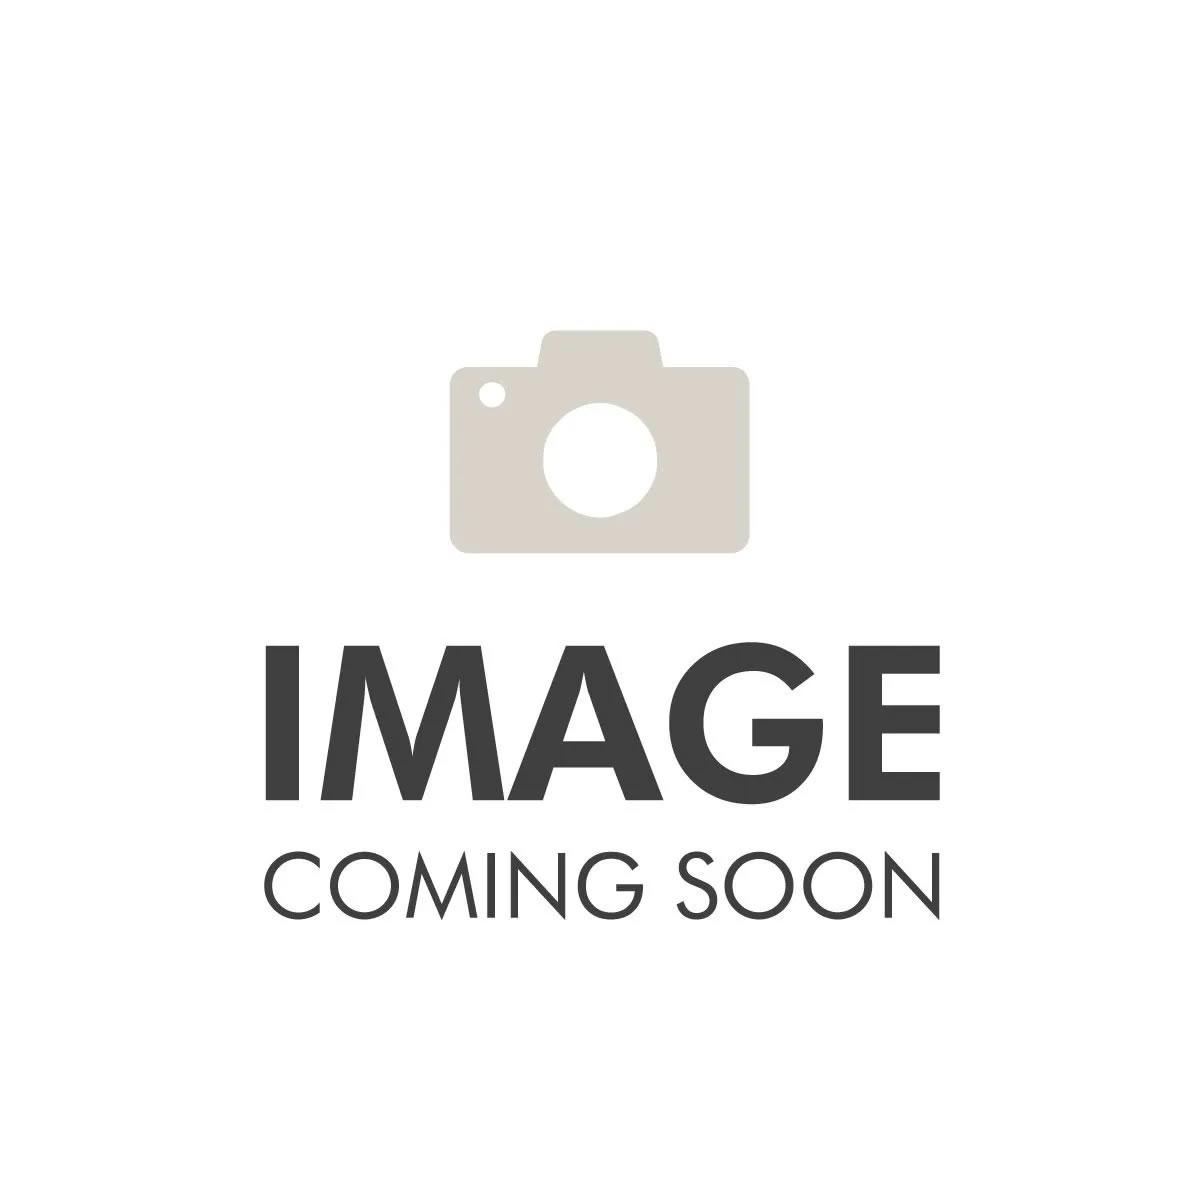 Soft Top Door Skins Black Denim Clear Windows 88-95 Jeep Wrangler